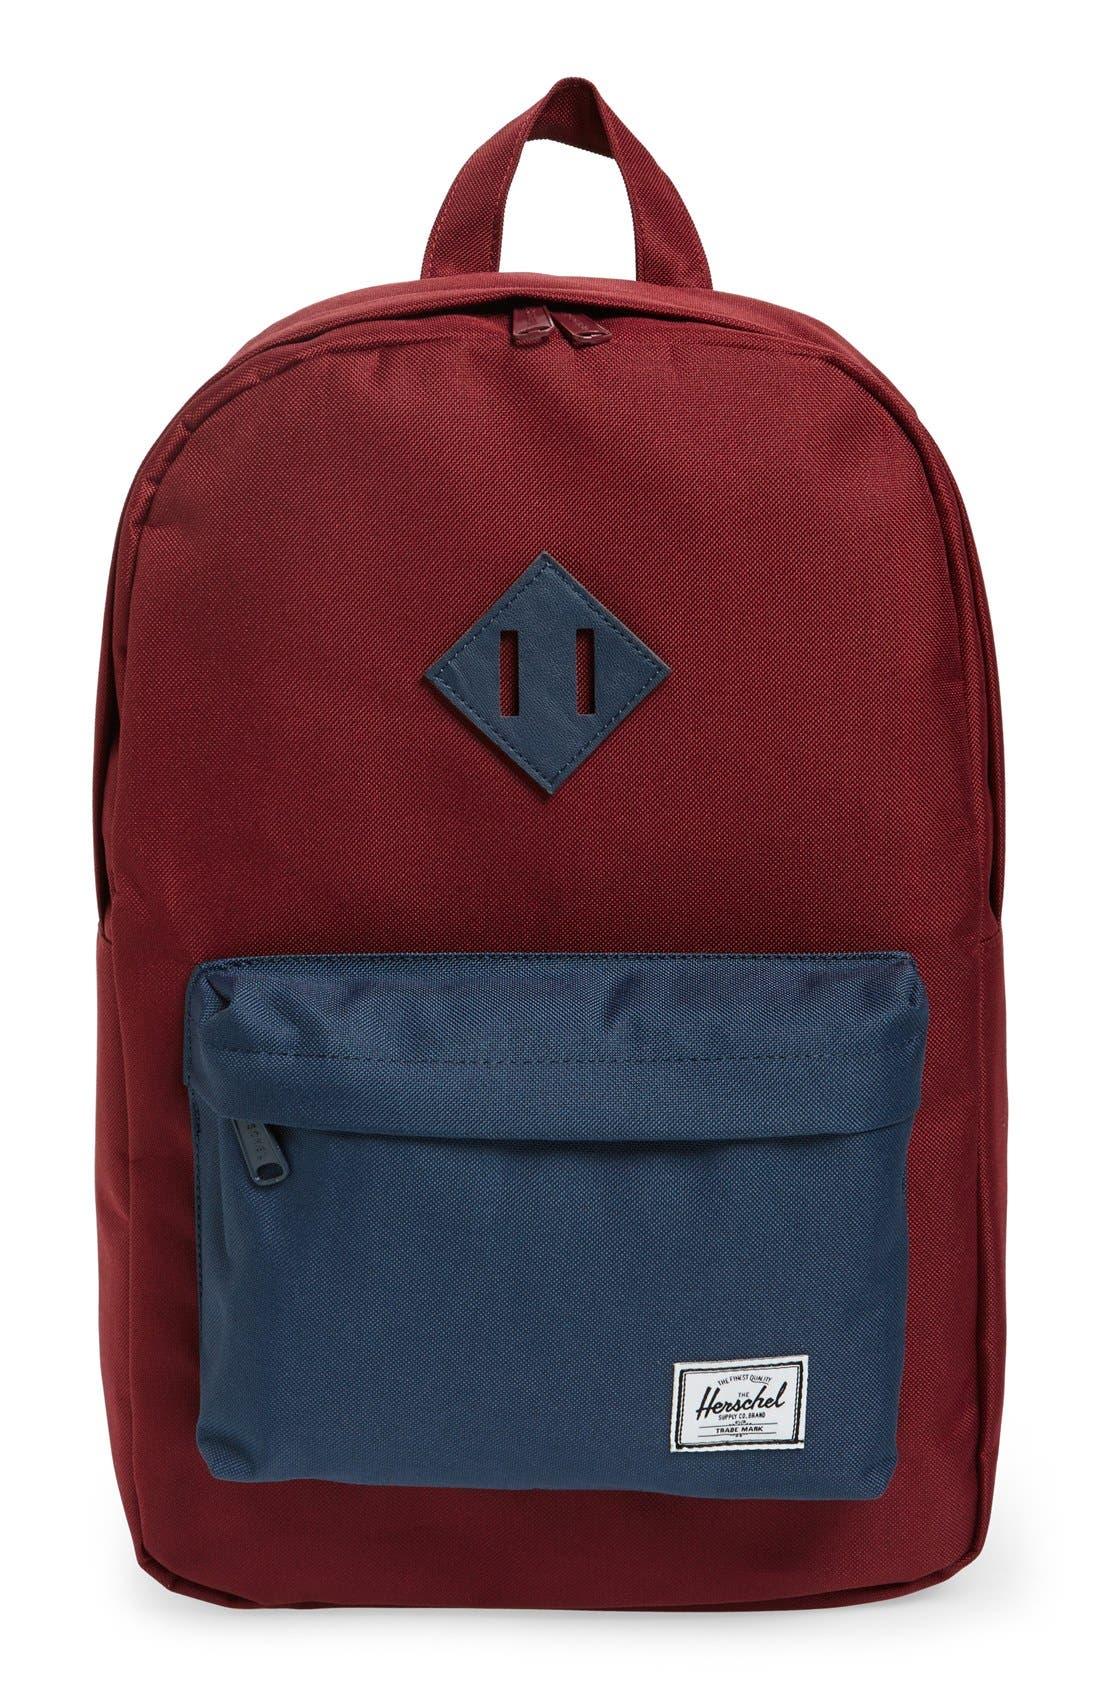 Main Image - Herschel Supply Co. 'Heritage Mid Volume' Backpack